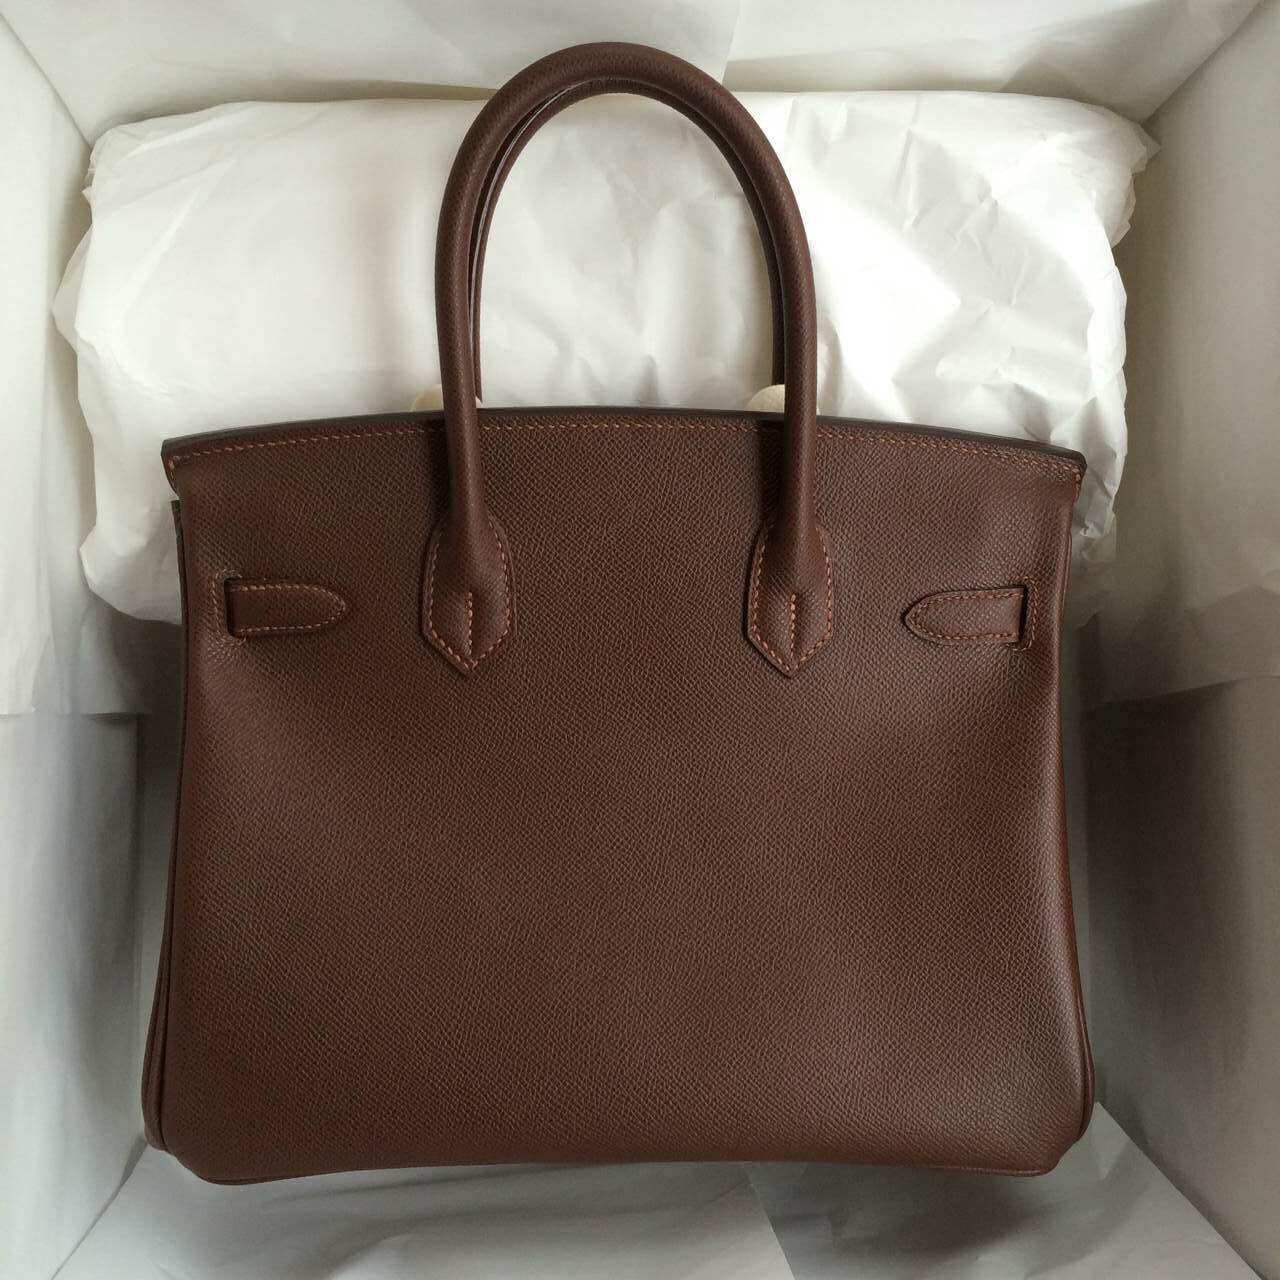 Wholesale Hermes Birkin Bag Coffee Color Epsom Calfskin Leather Women's Tote Bag